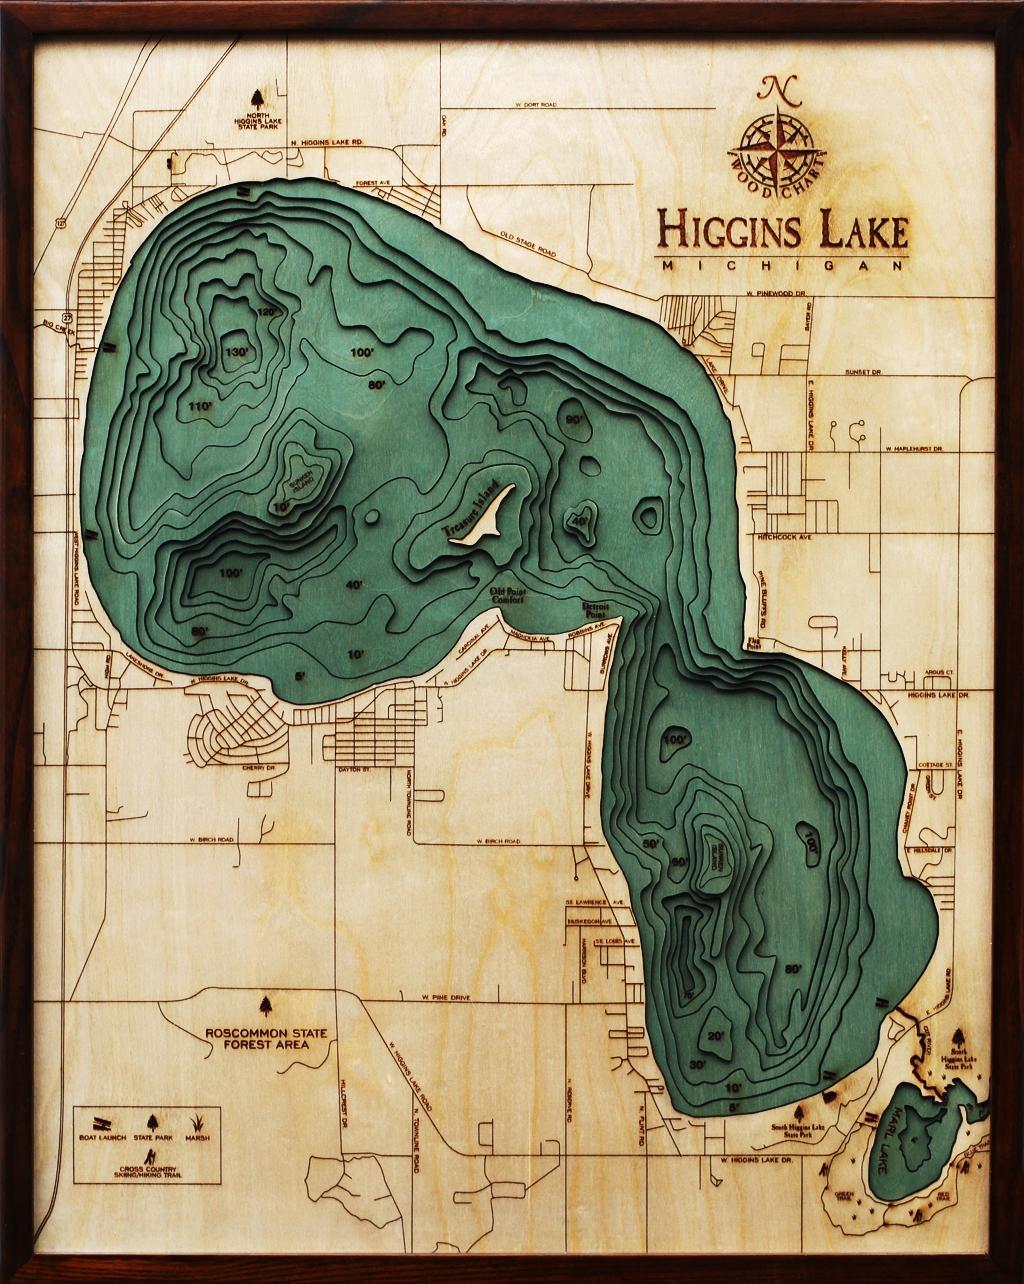 Higgins Lake Nautical Real Wood Map Depth Decorative Chart